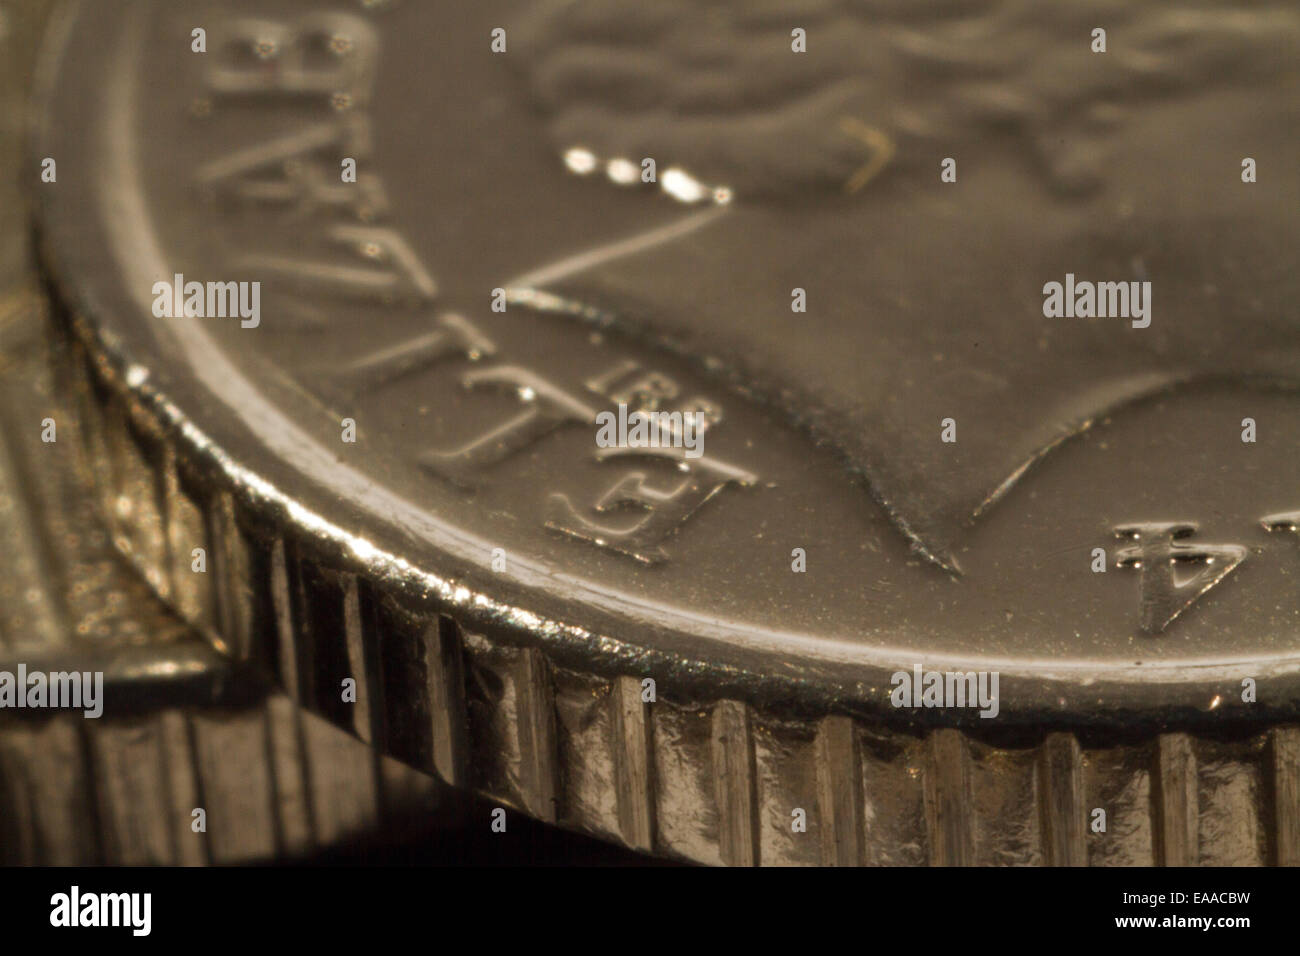 Close up photograph of English Money - Stock Image